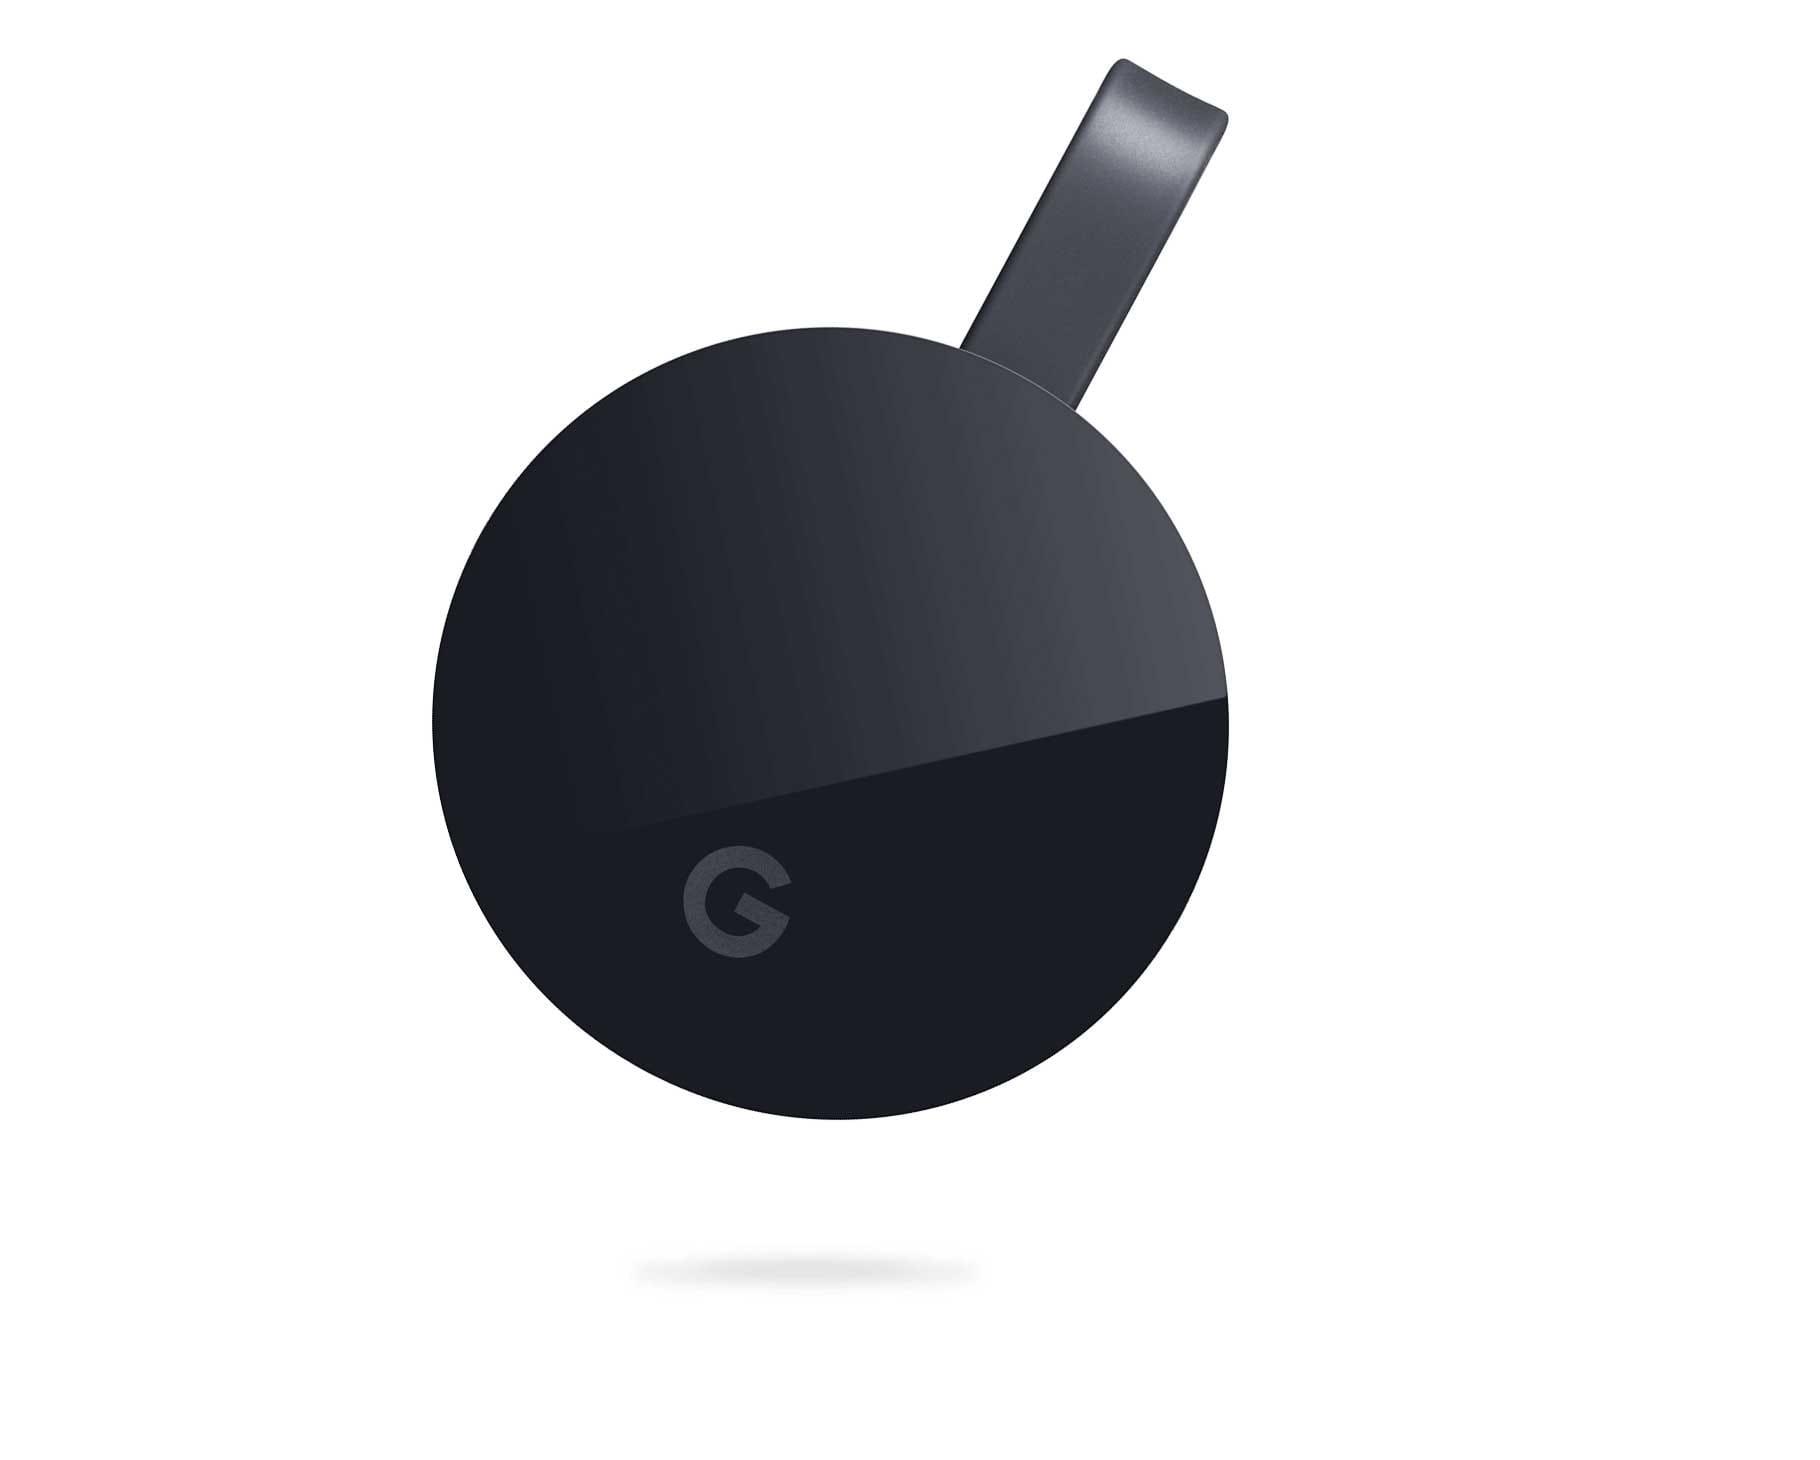 Bedroom Home Office Chromecast Ultra Chromecast Google